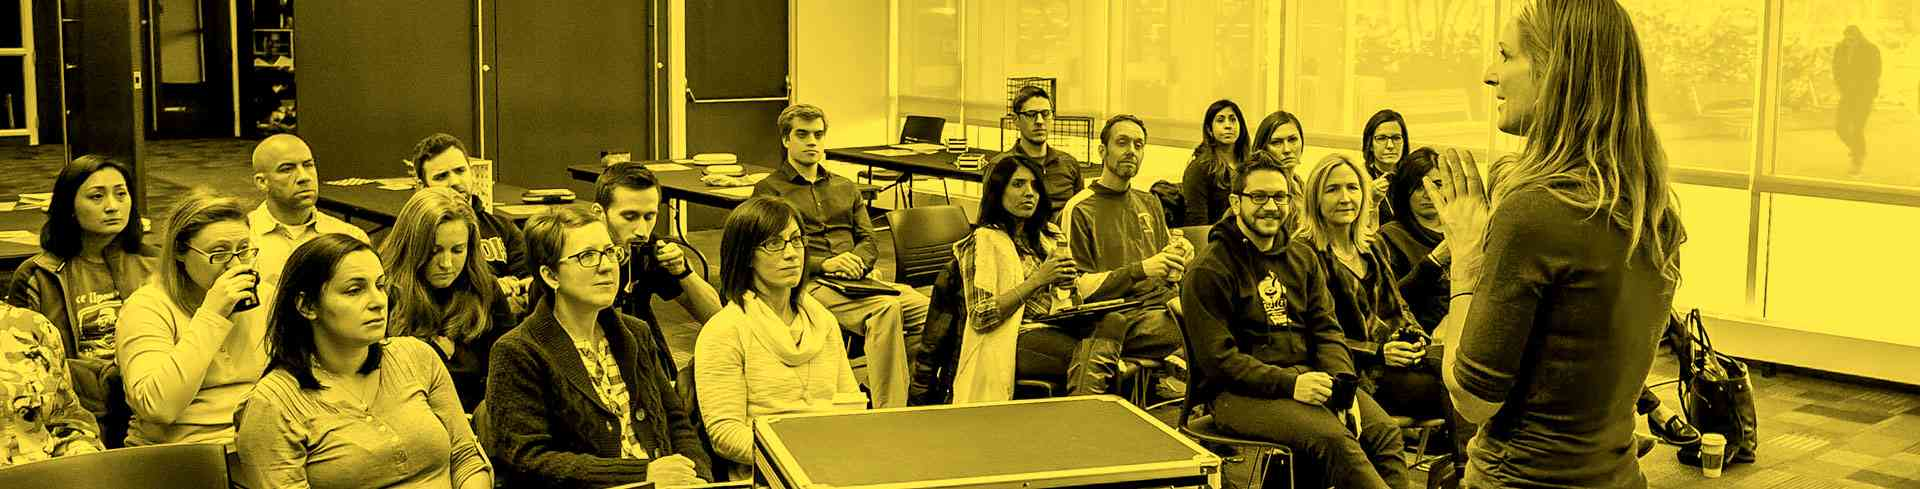 Curso Diseño de cursos en modalidad mixta o blended